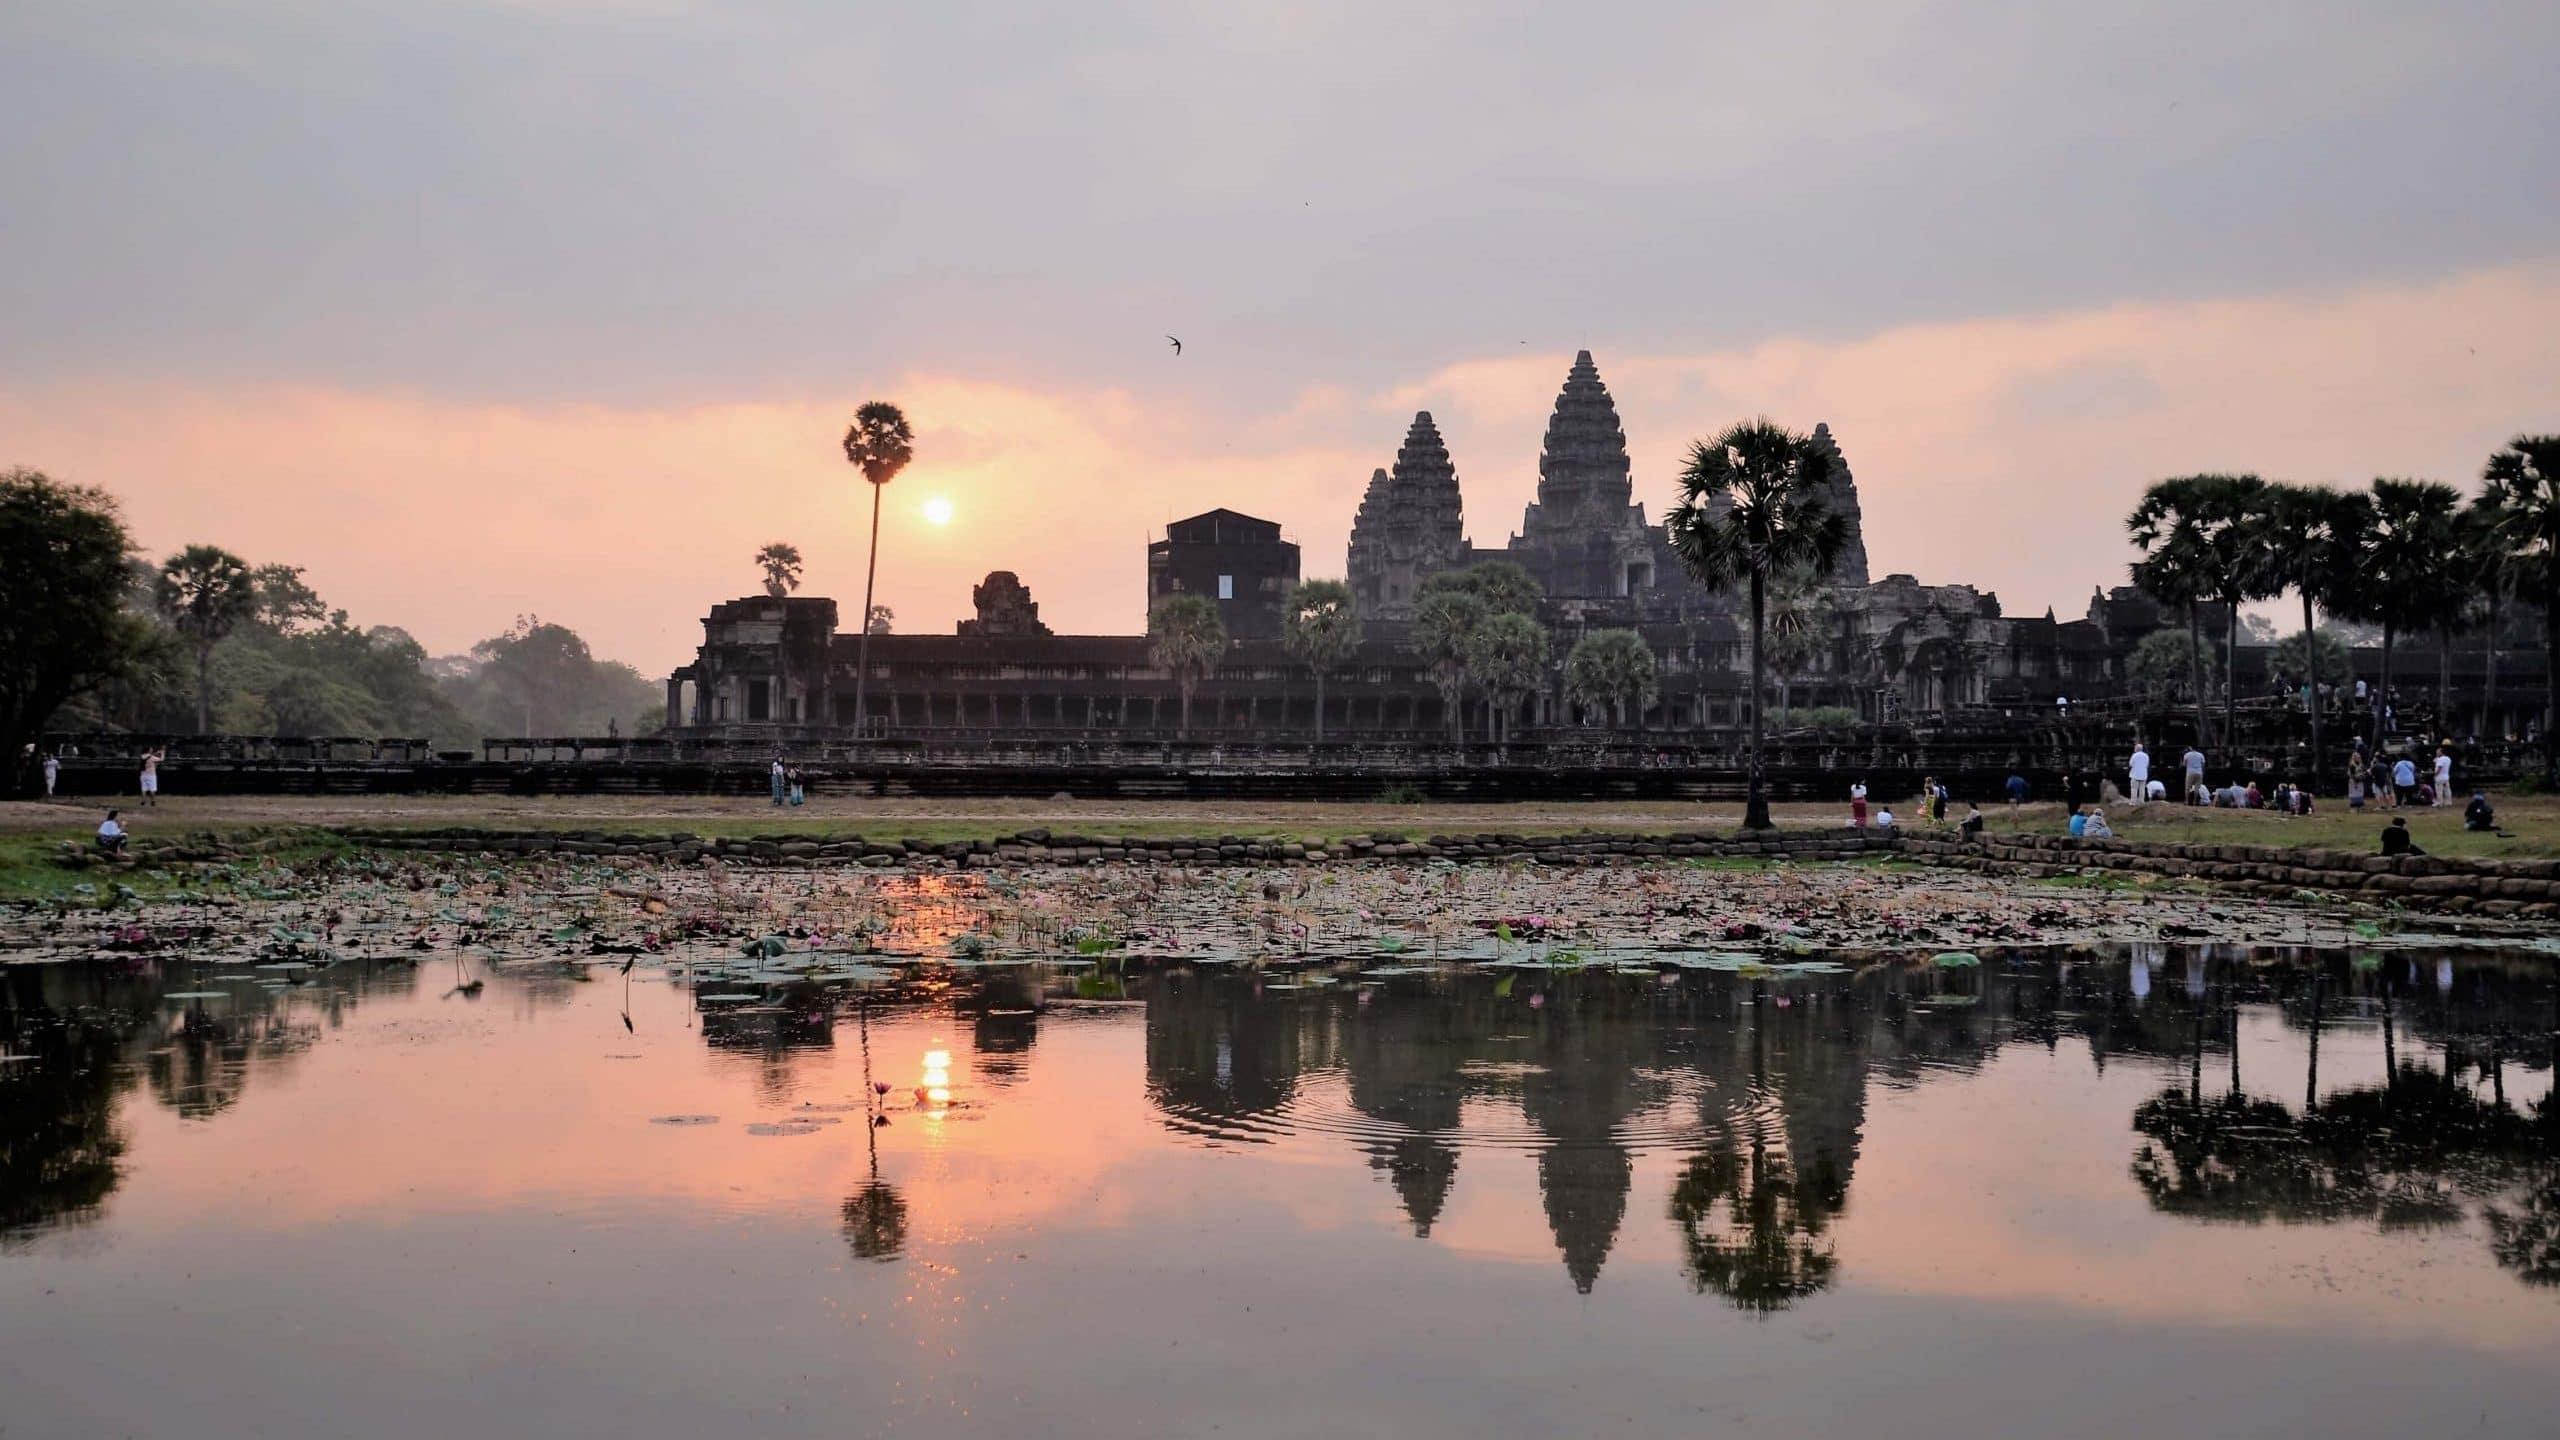 Sehenswürdigkeiten Kambodscha  Angkor Wat Tempel